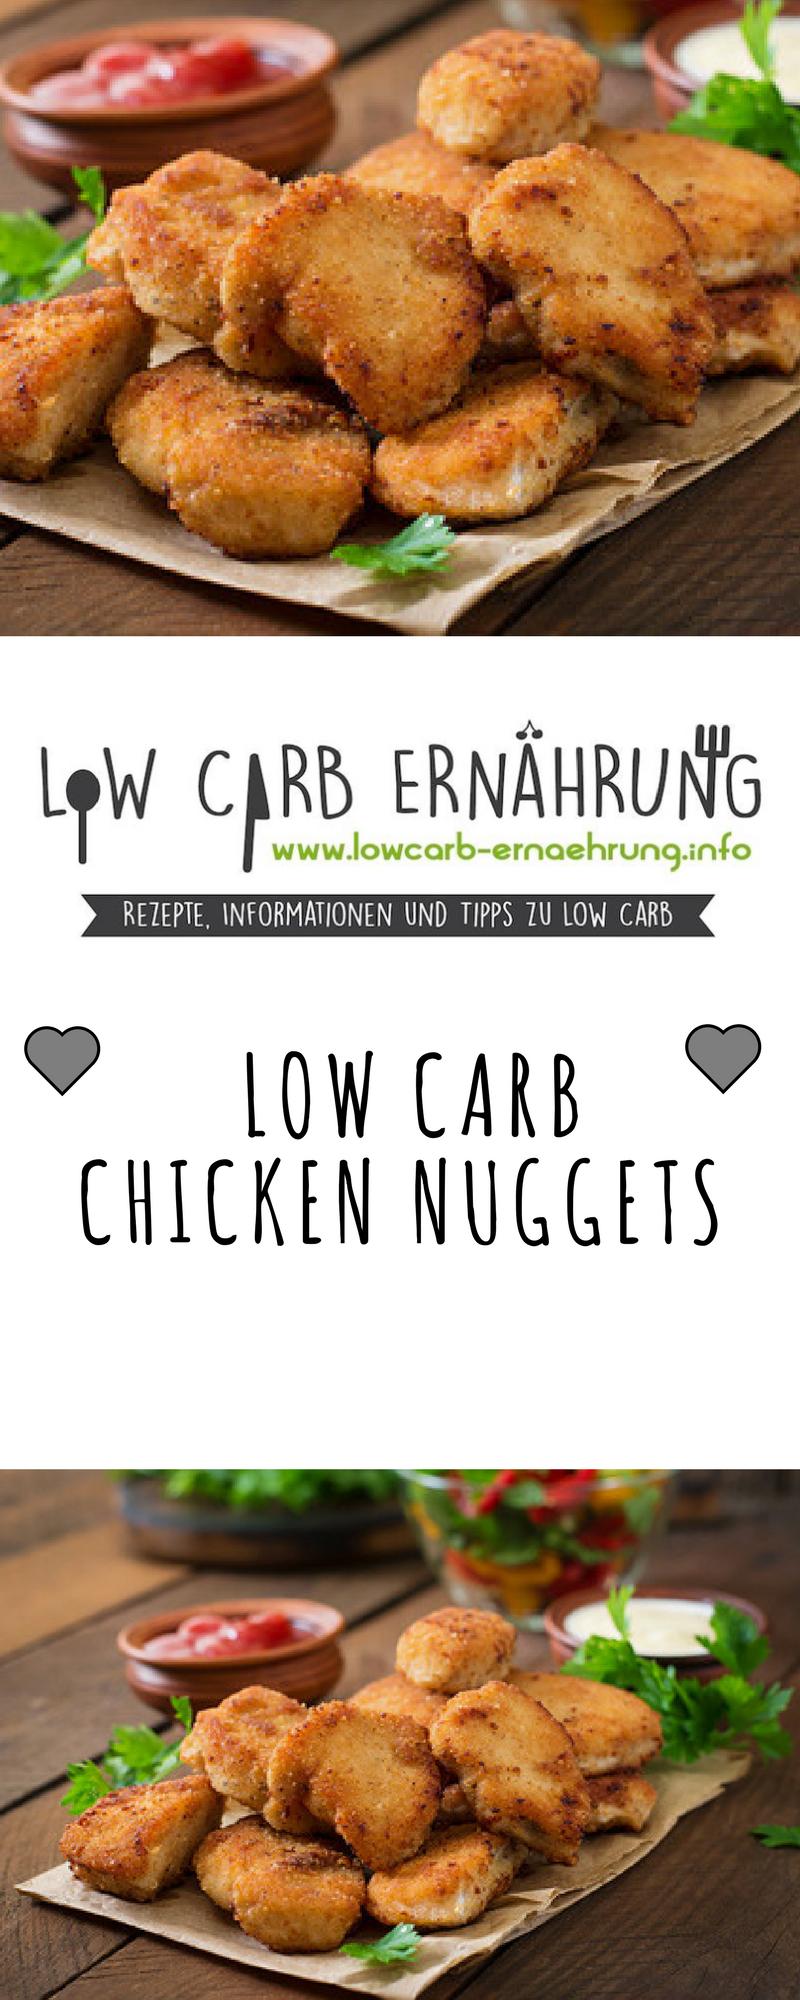 low carb rezept f r leckere chicken nuggets mit wenig kohlenhydraten low carb und einfa low. Black Bedroom Furniture Sets. Home Design Ideas